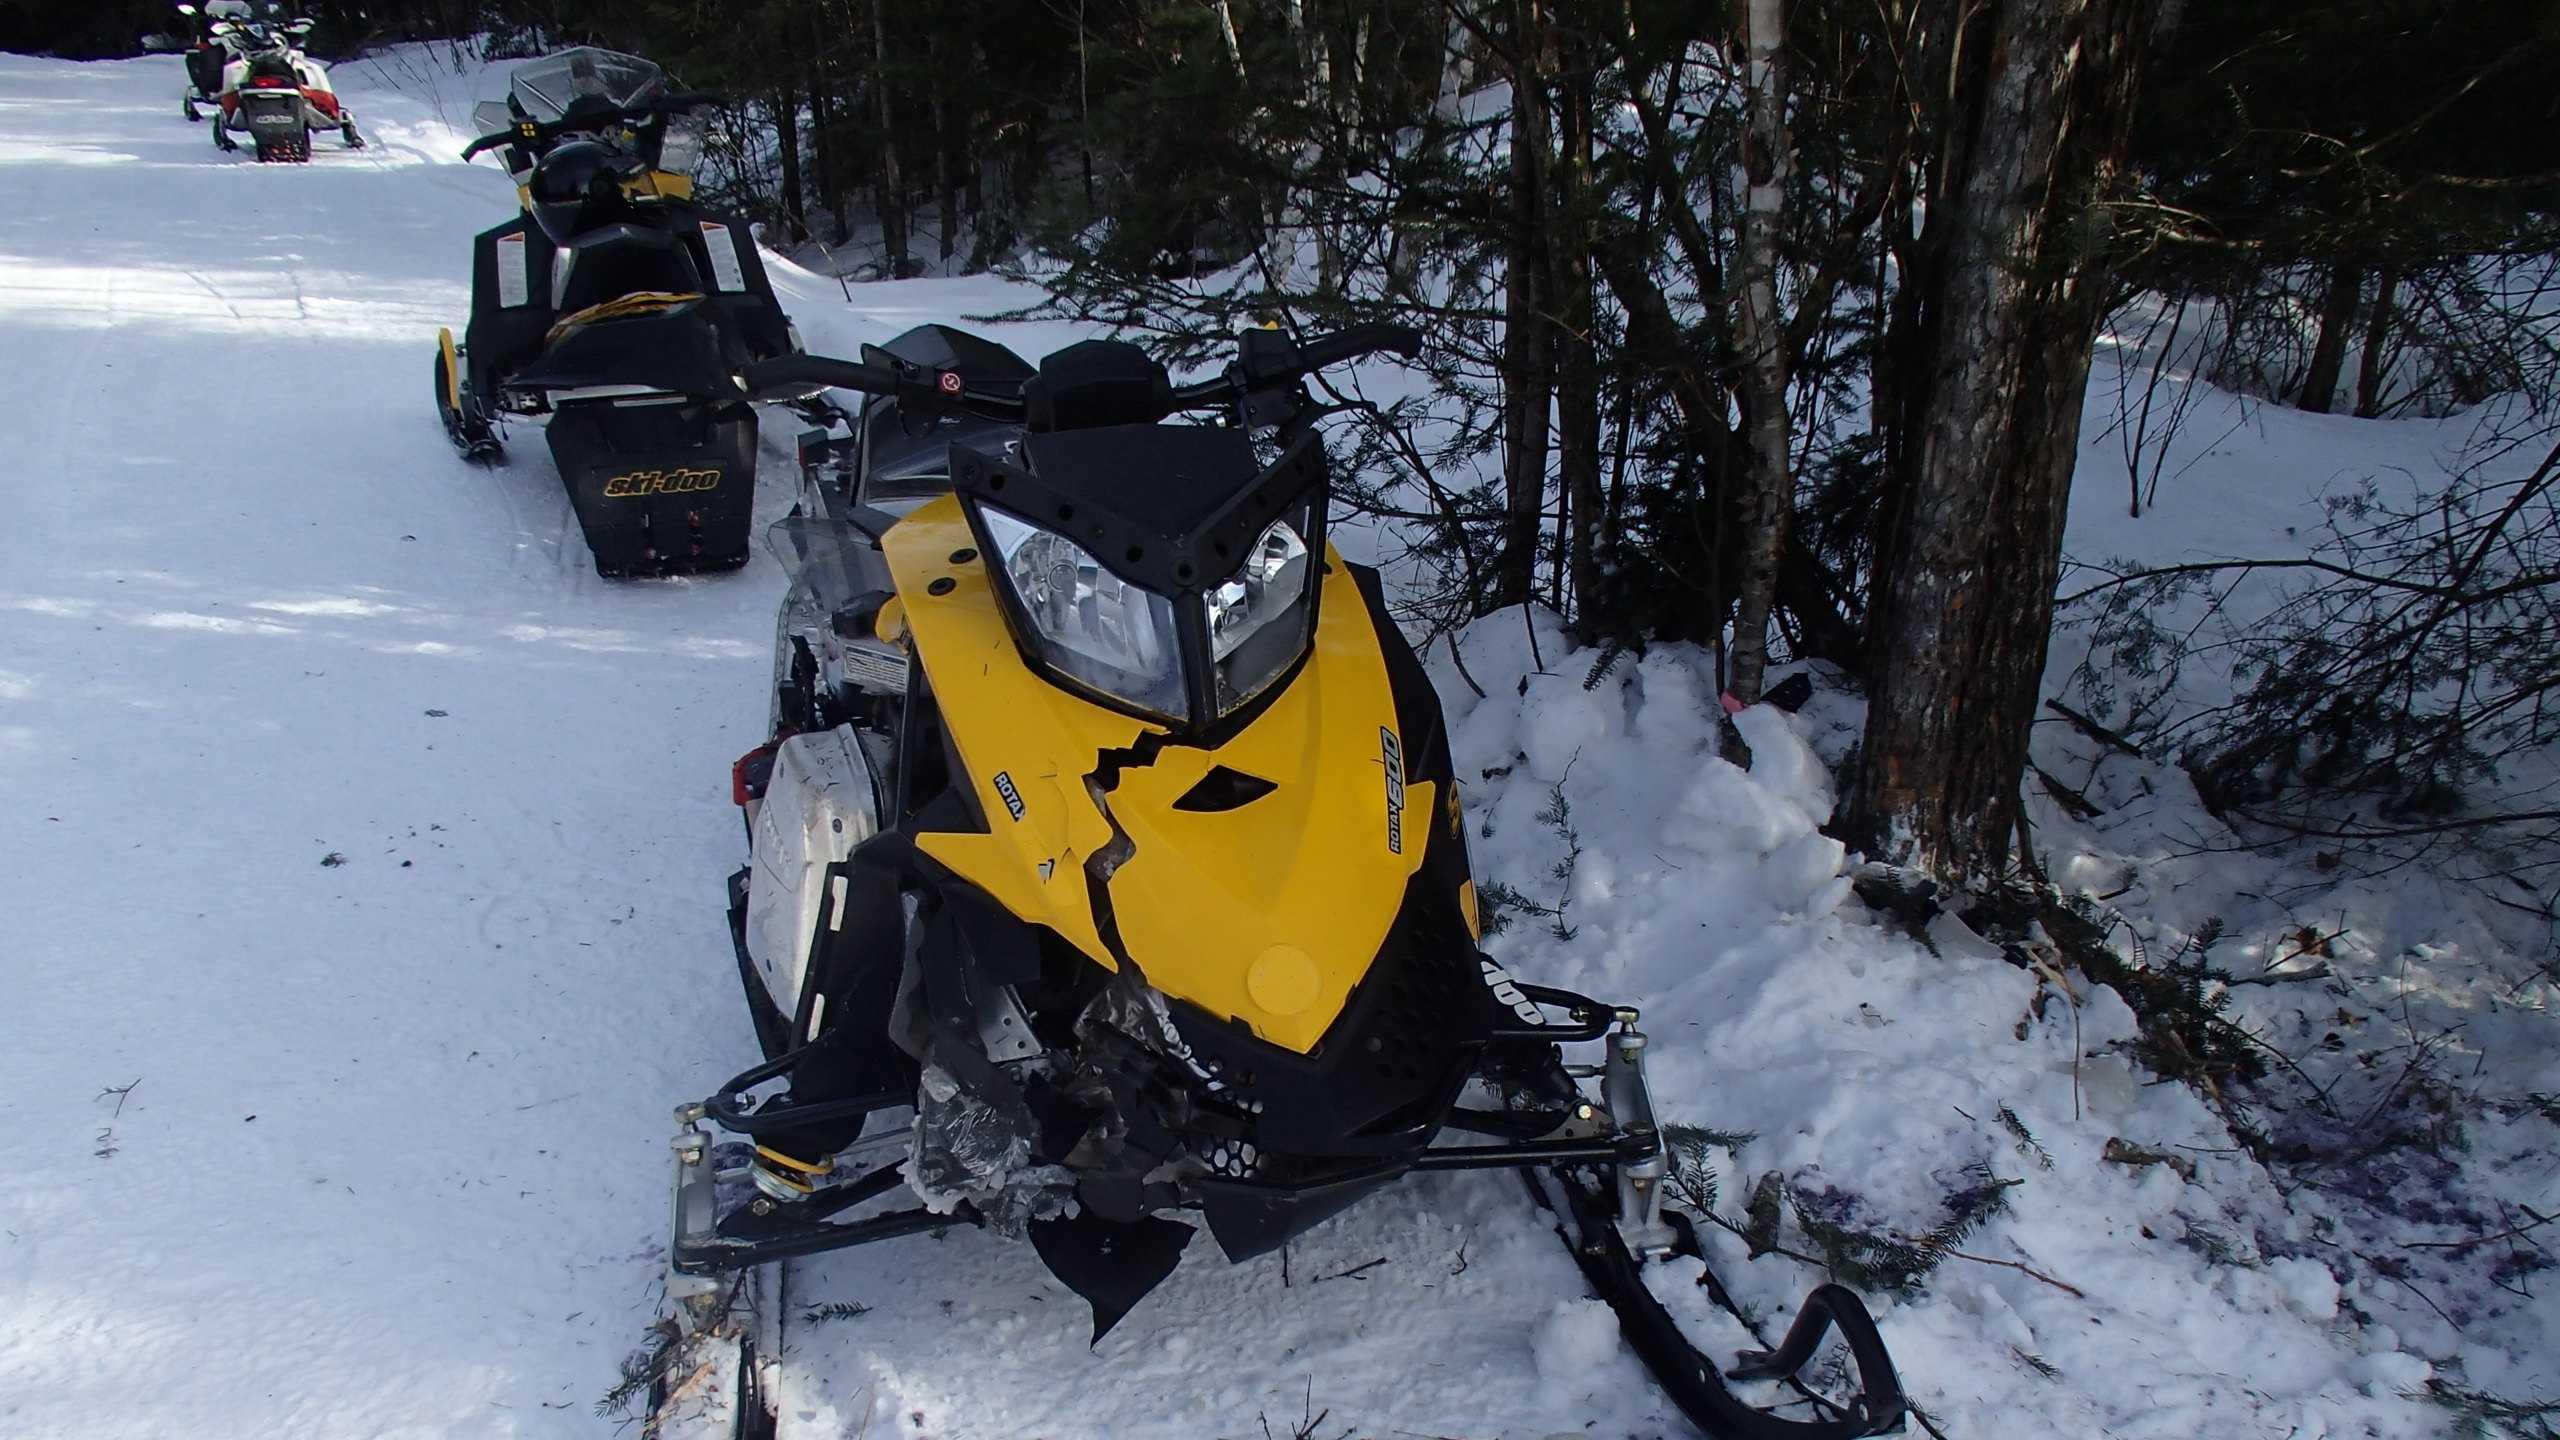 Pelham man injured in snowmobile accident